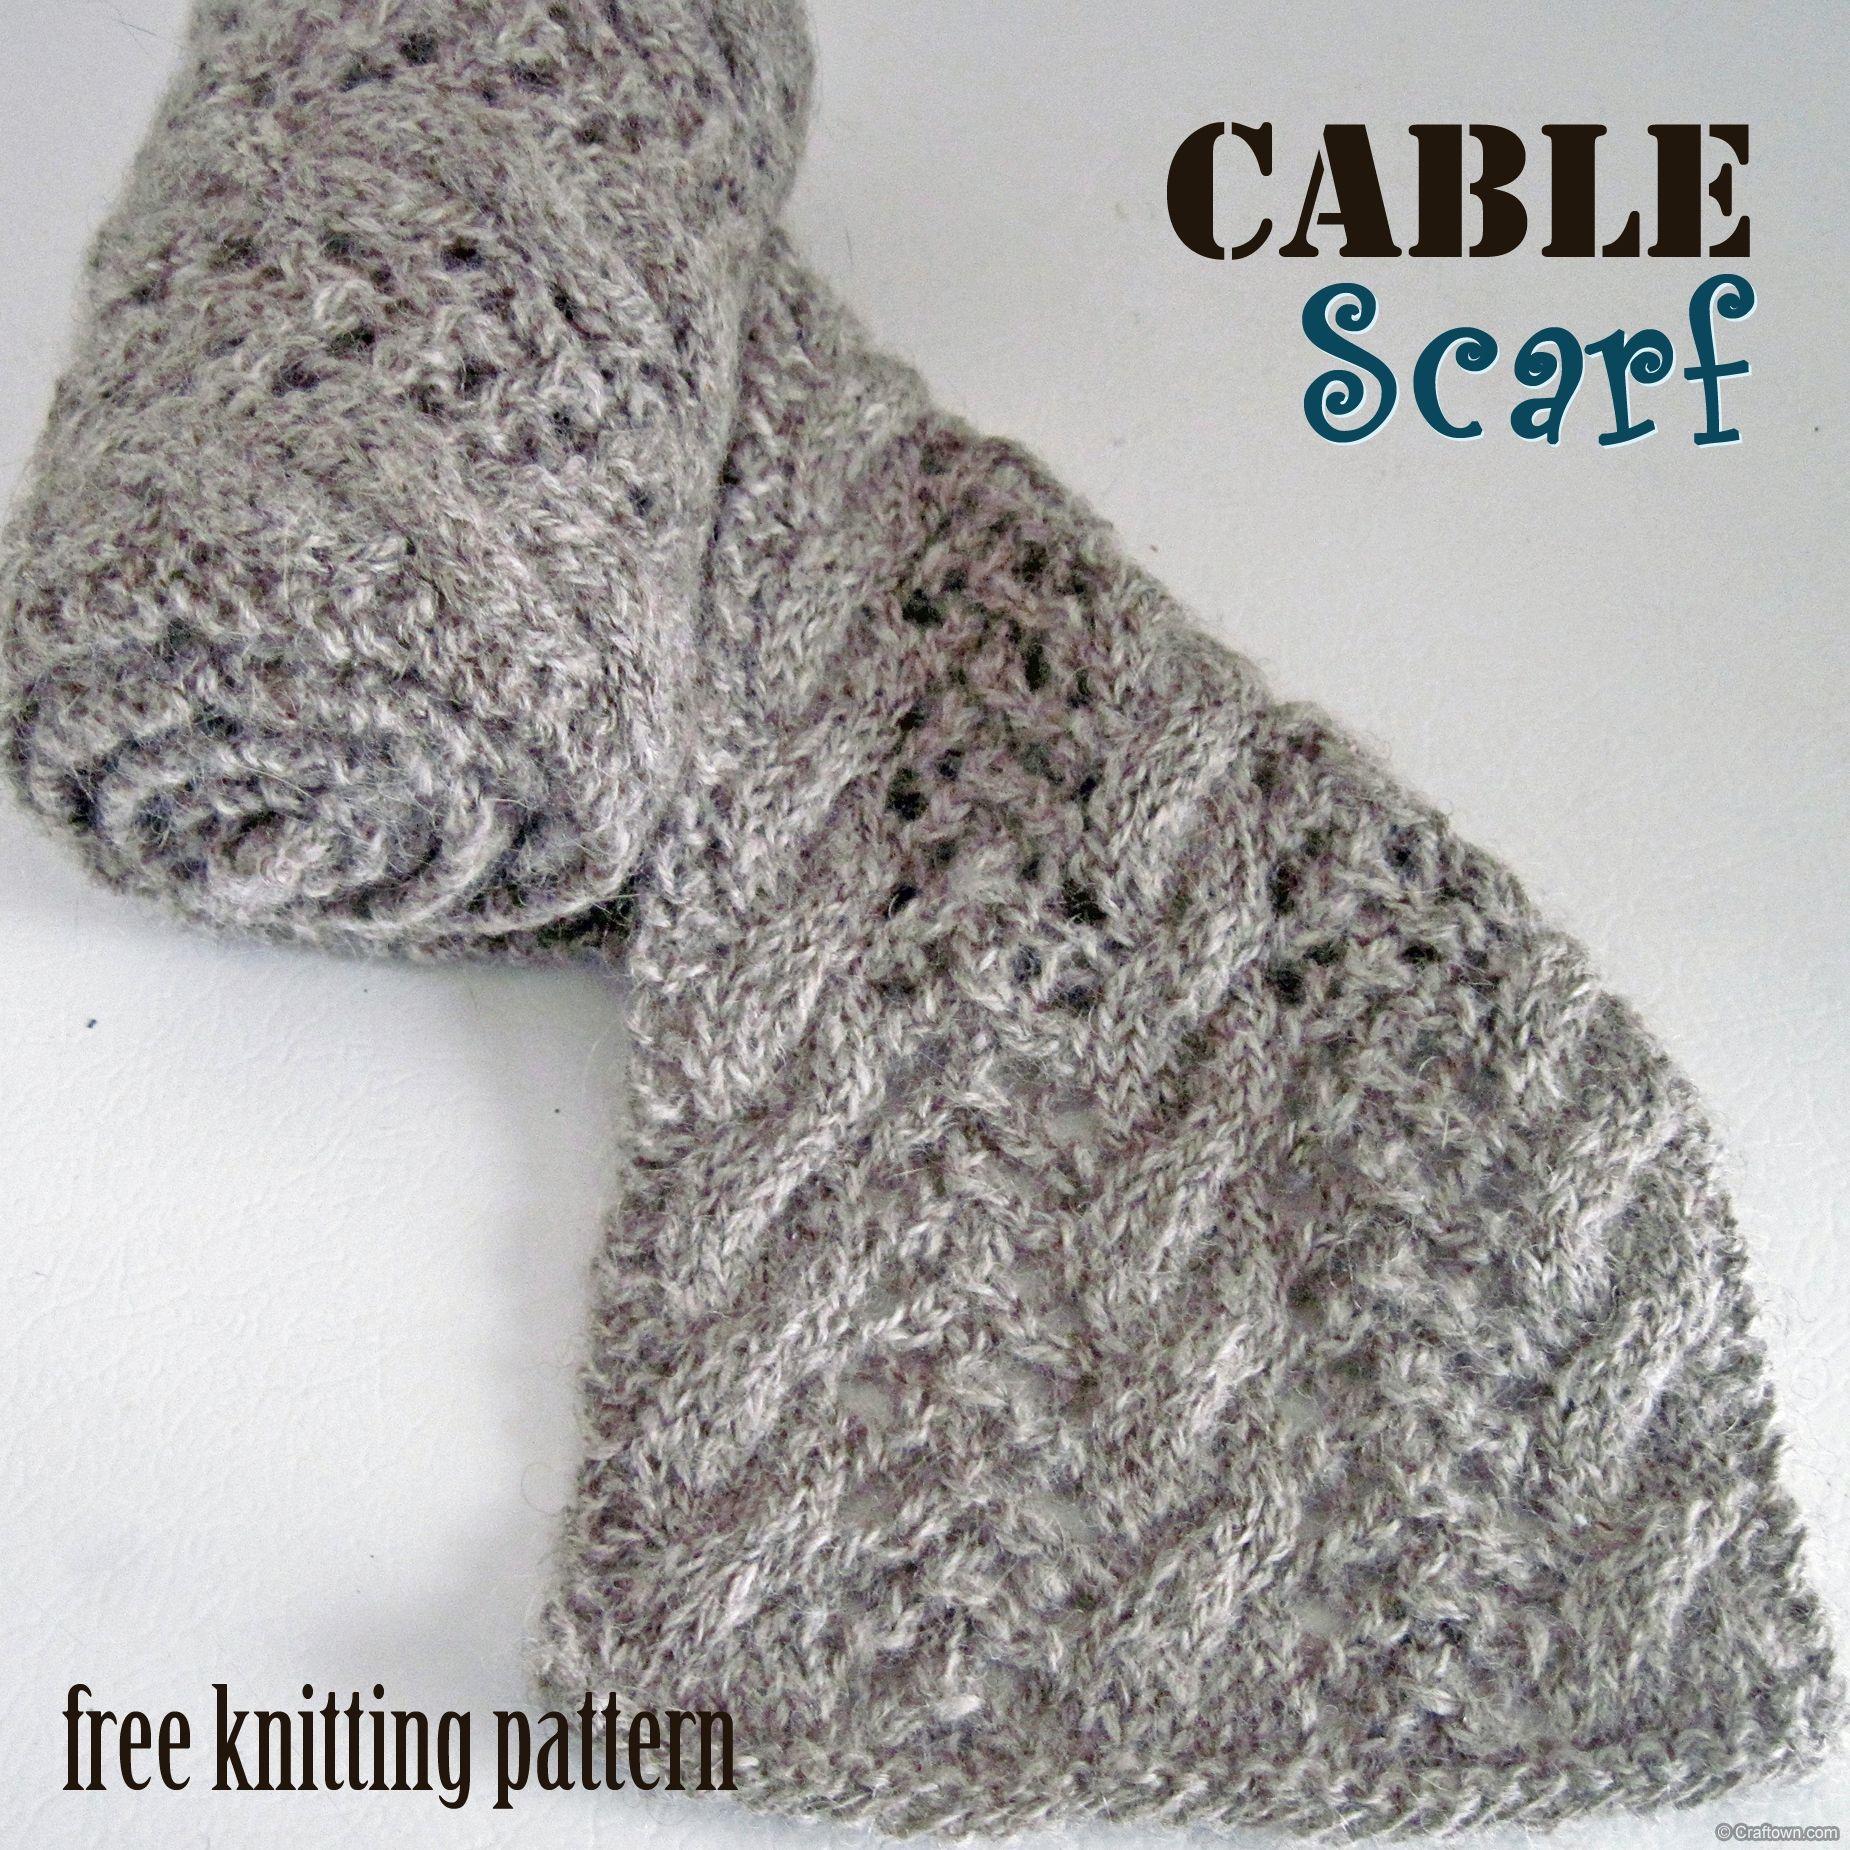 Free Knitting Pattern - Cable Scarf | Knitting isn\'t Sitting ...